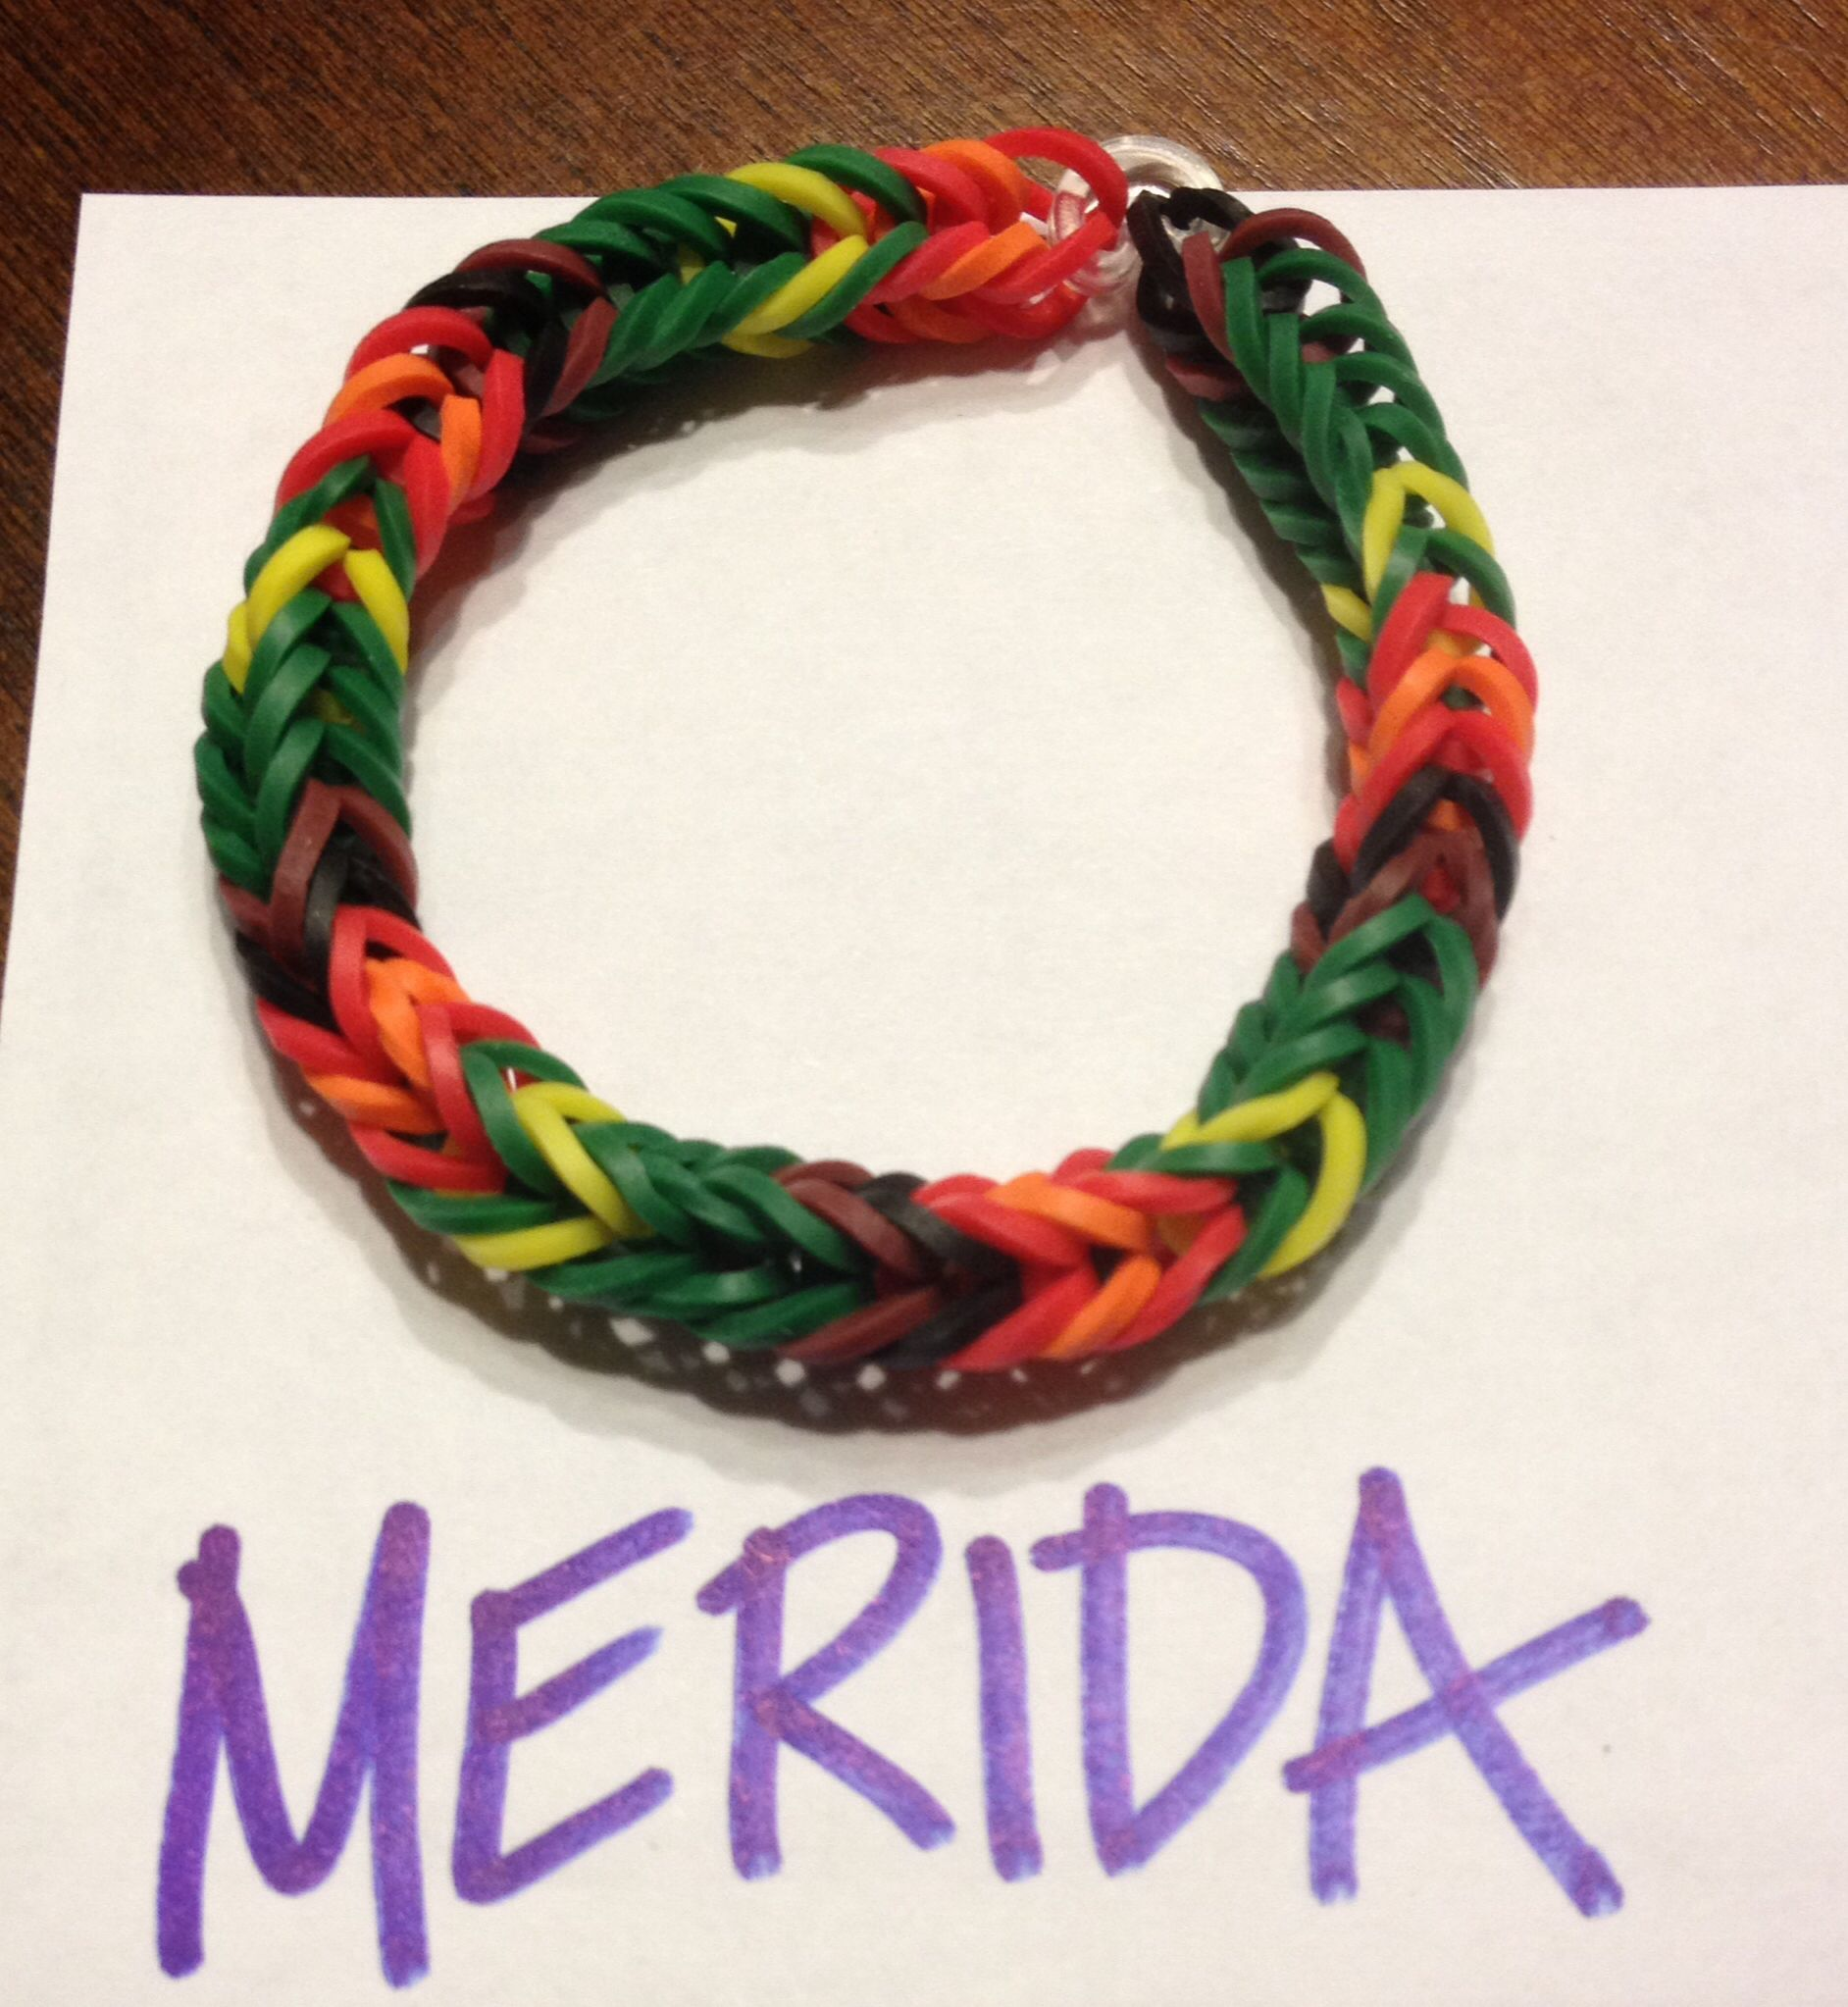 9527b52aedc6 Disney Girls Rubber Band bracelet: Merida inspired colors. | Rainbow ...